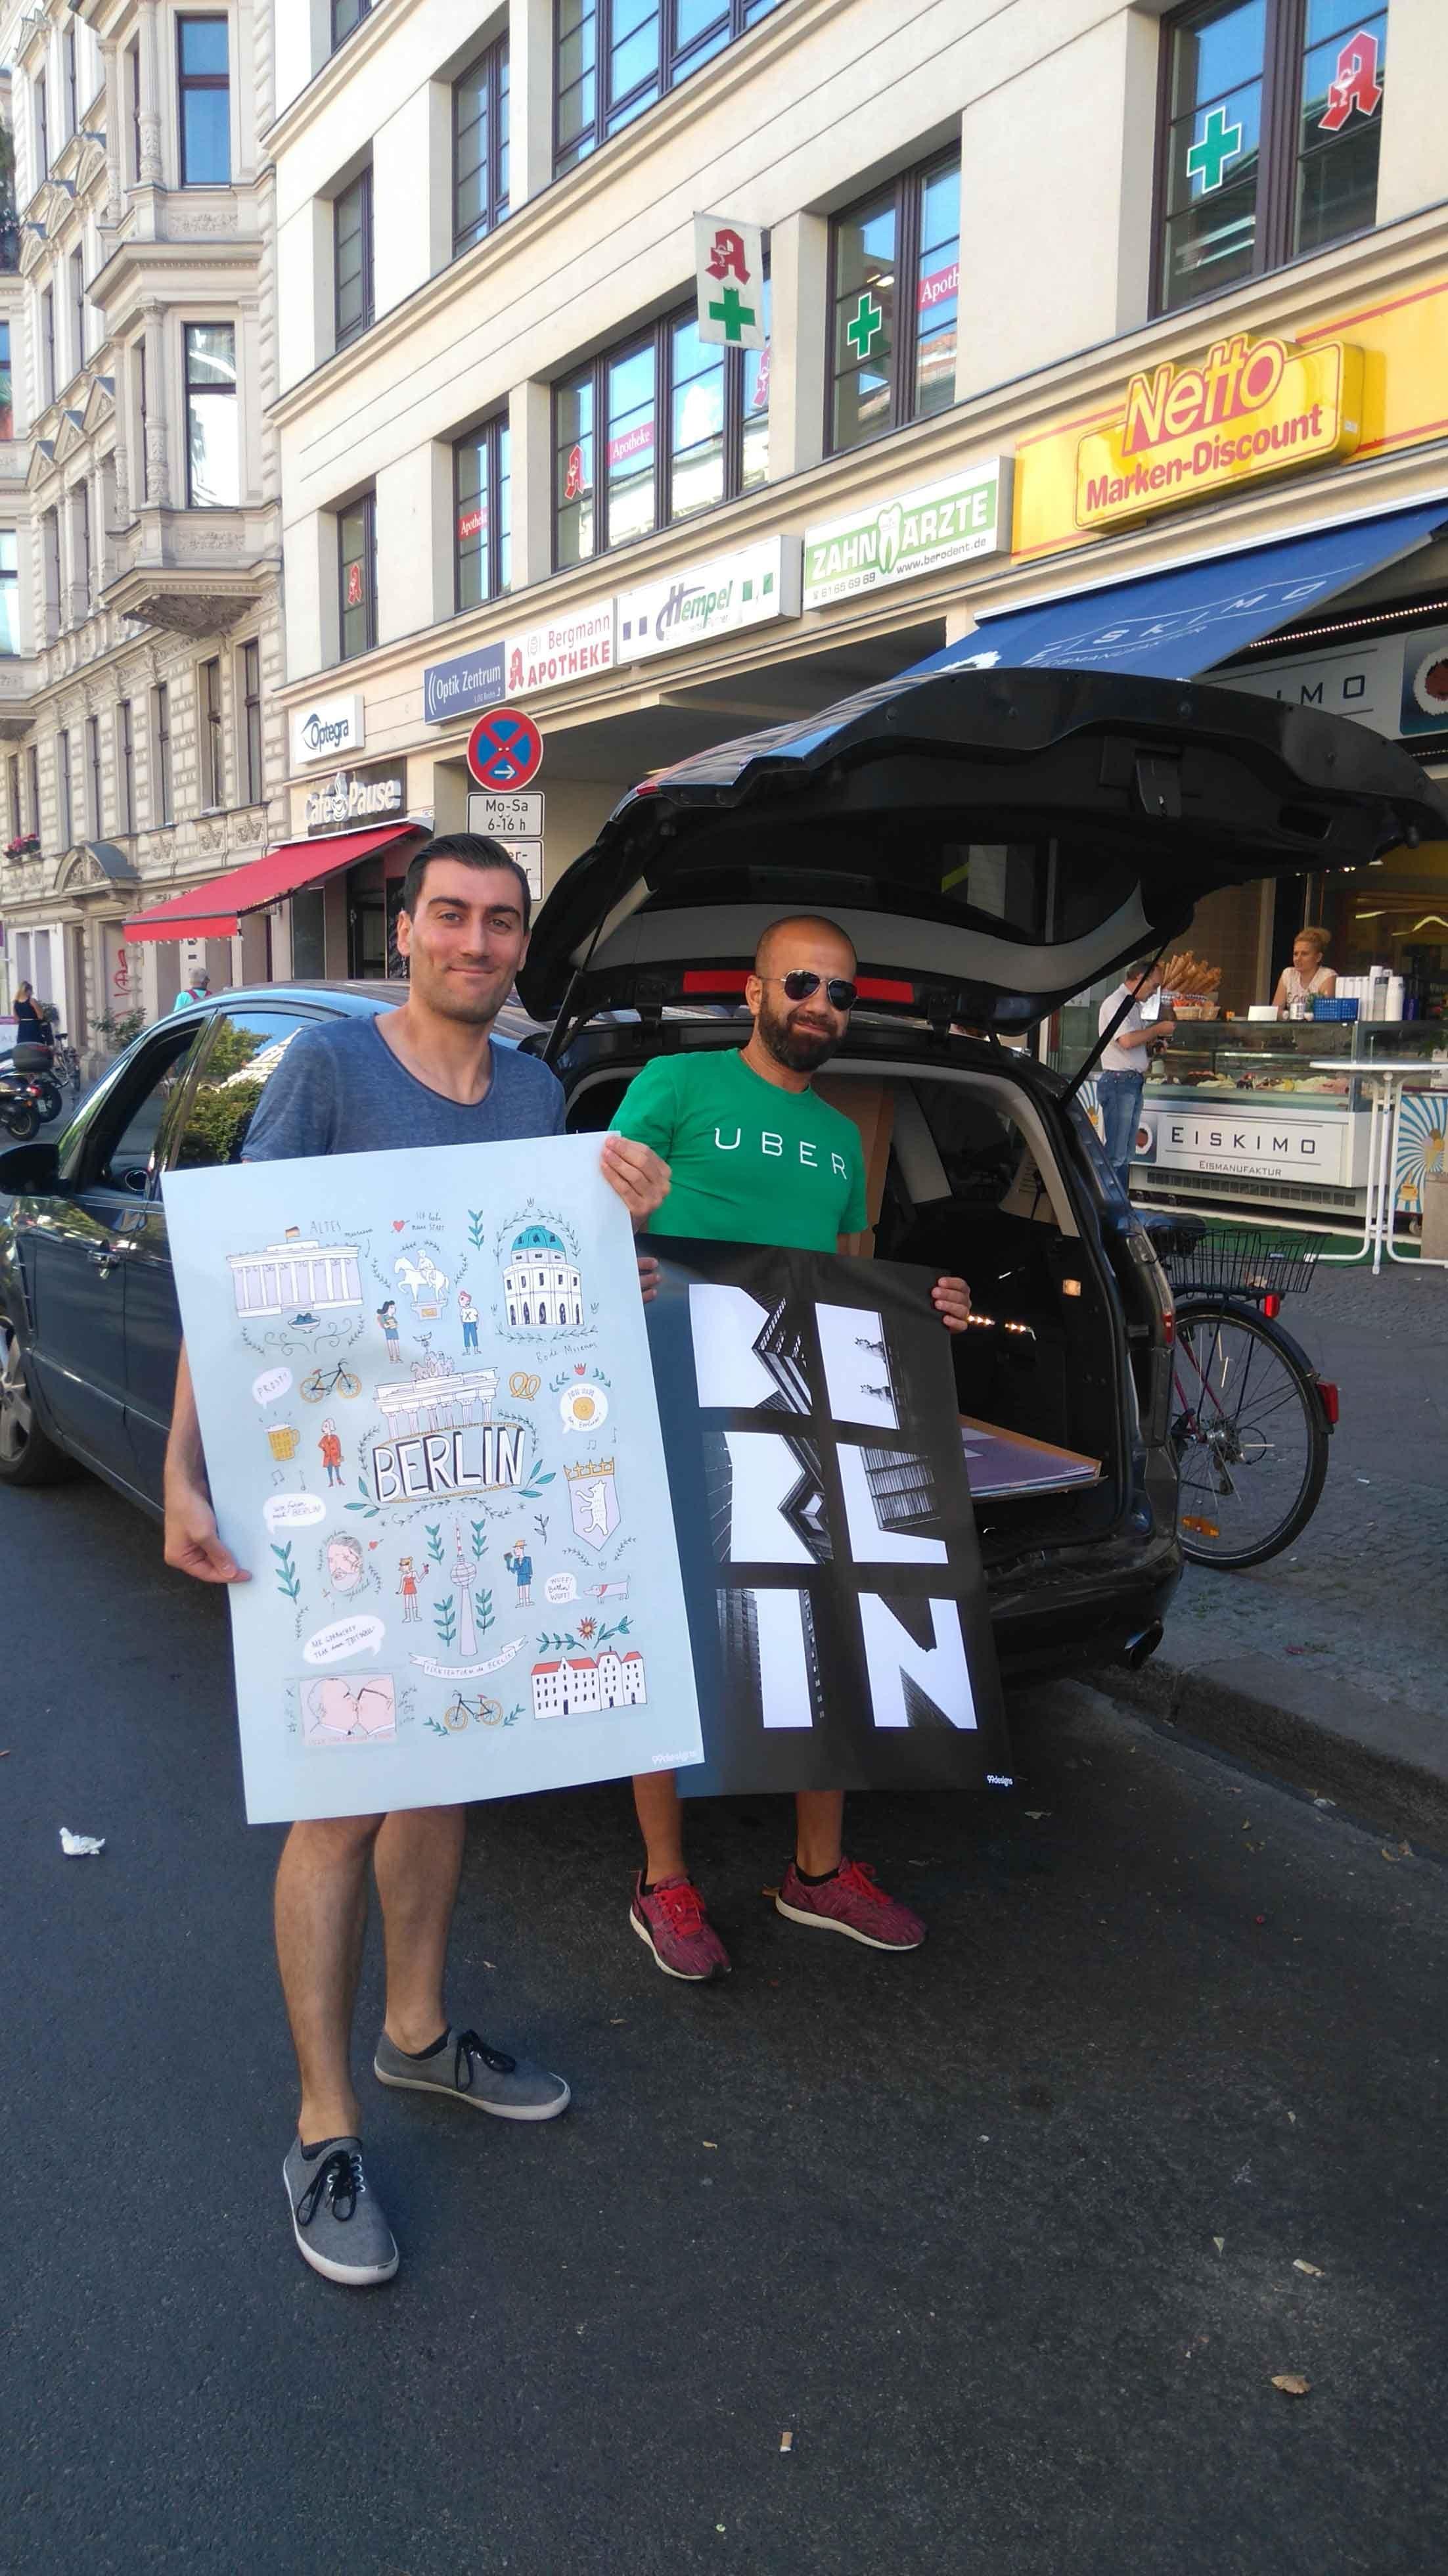 Uber City-Poster Aktion